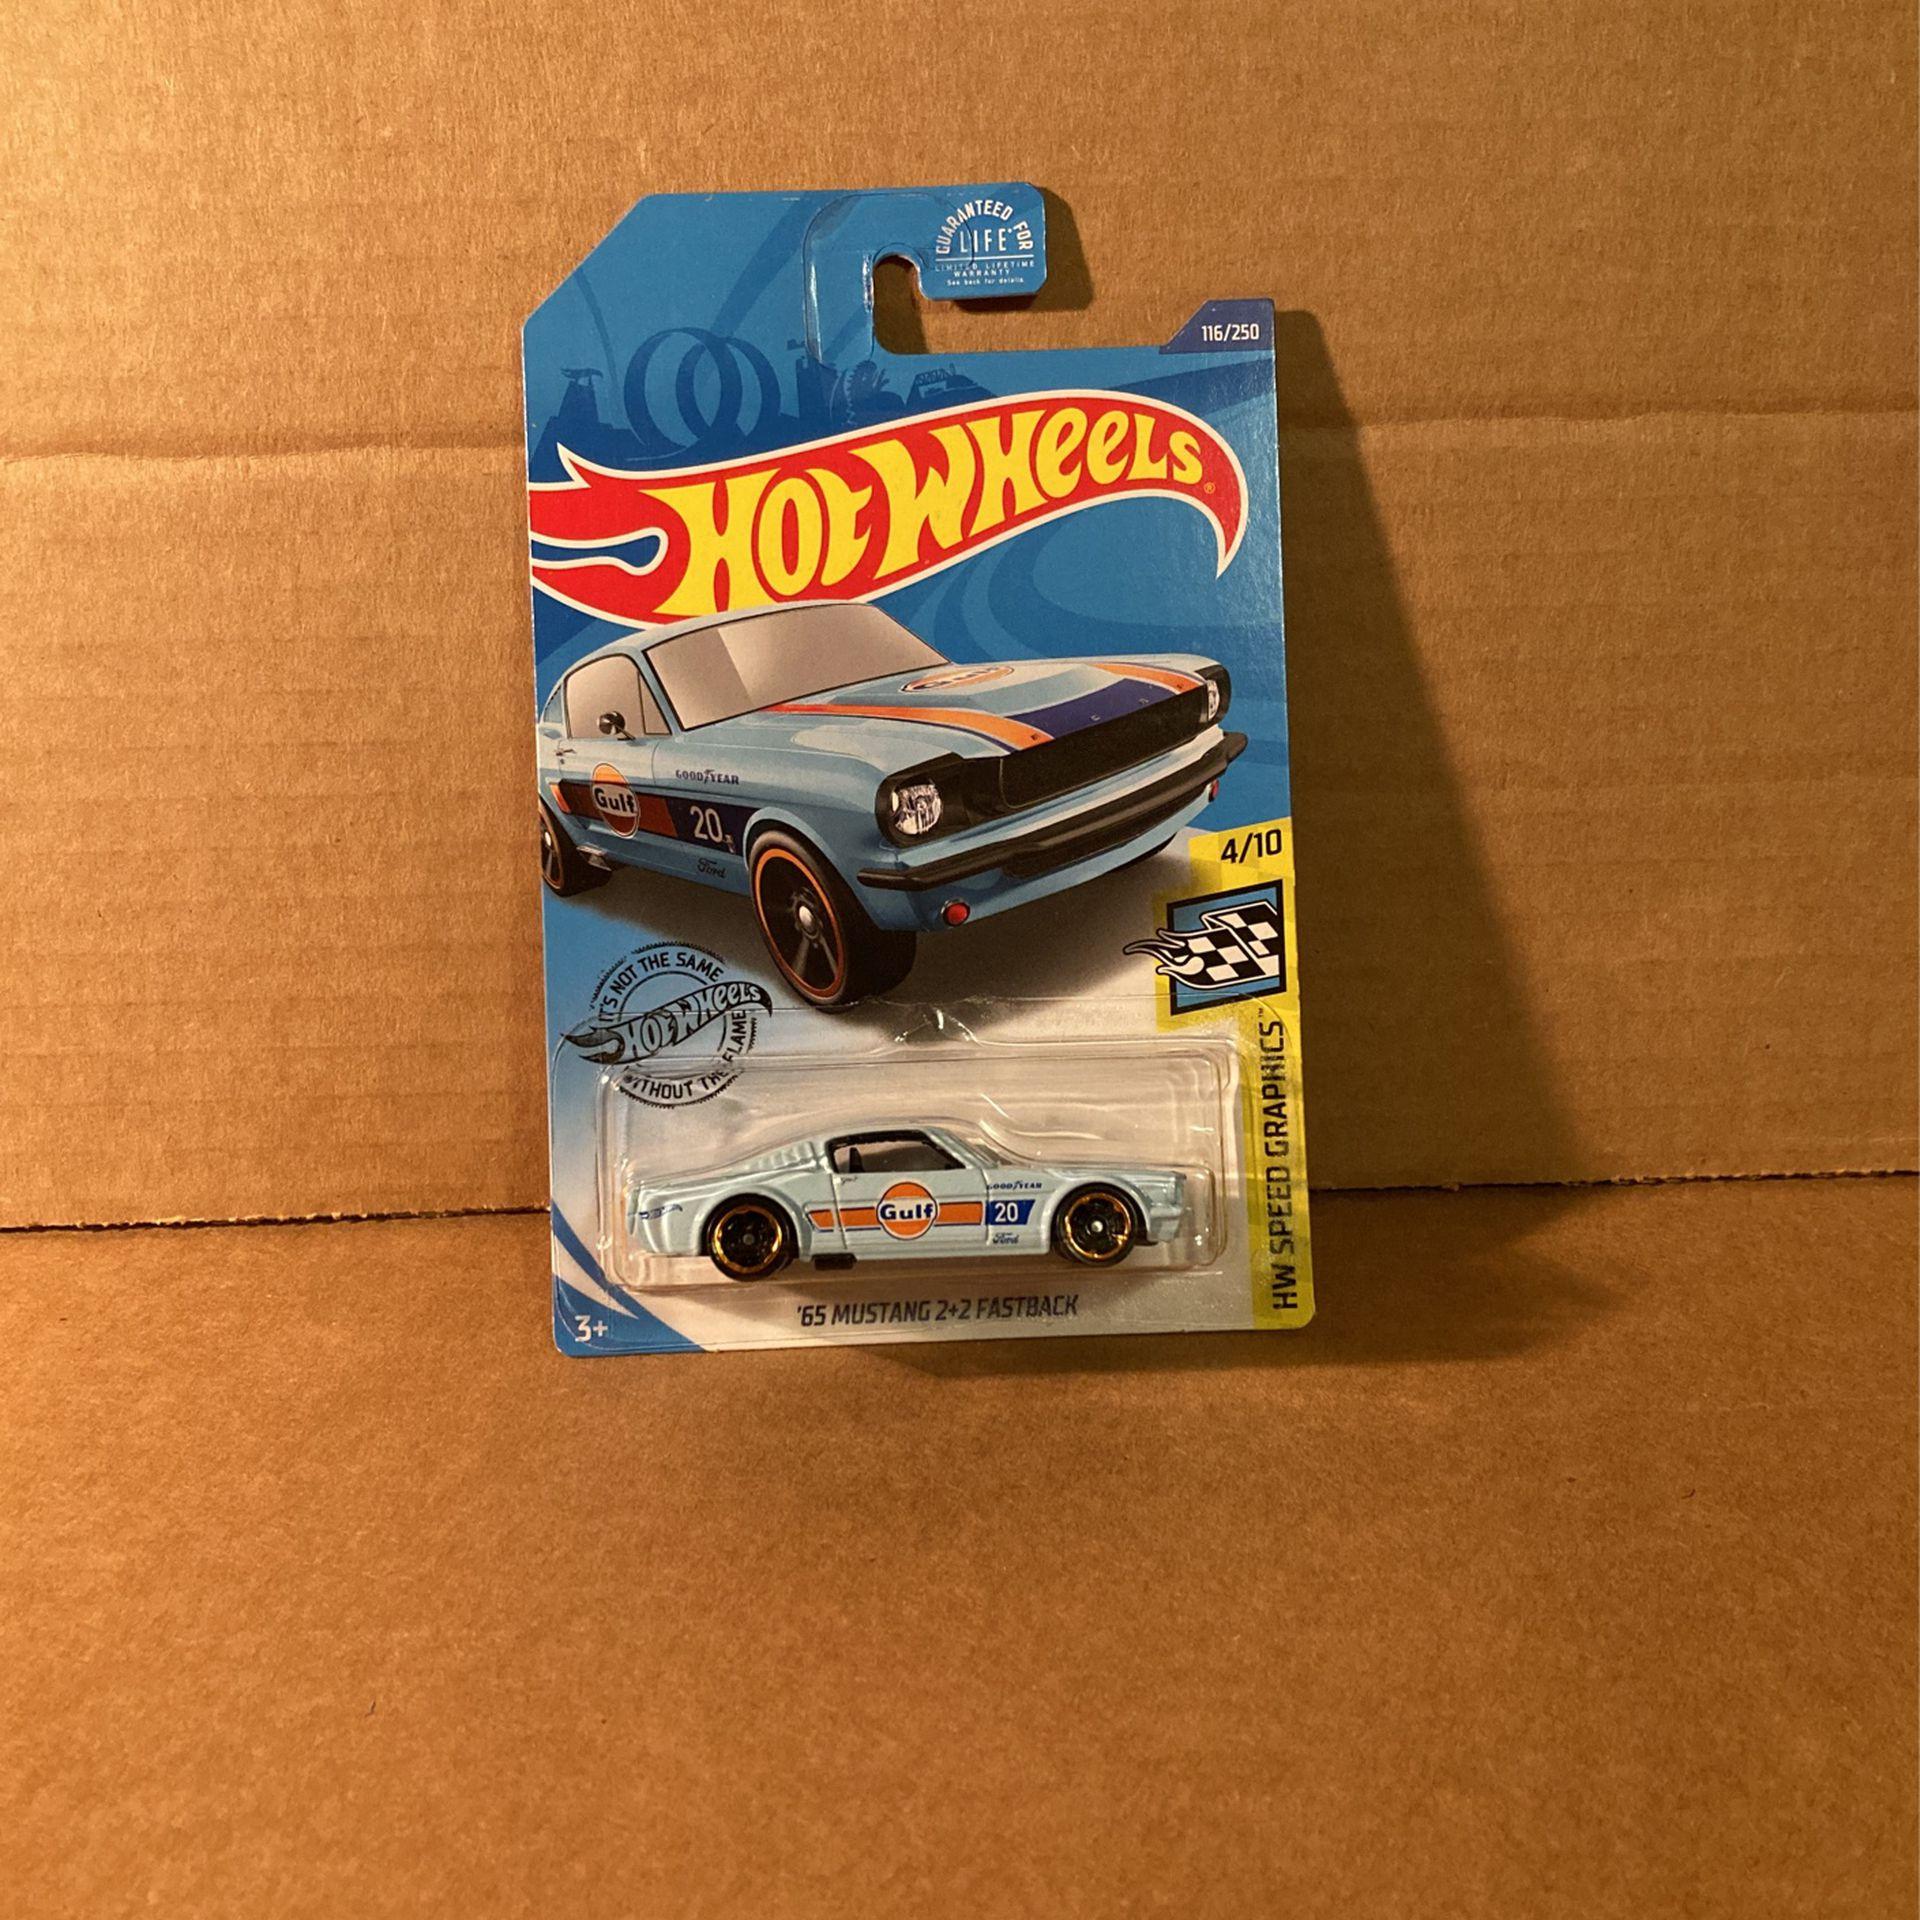 Hot Wheels '65 Mustang 2+2 Fastback